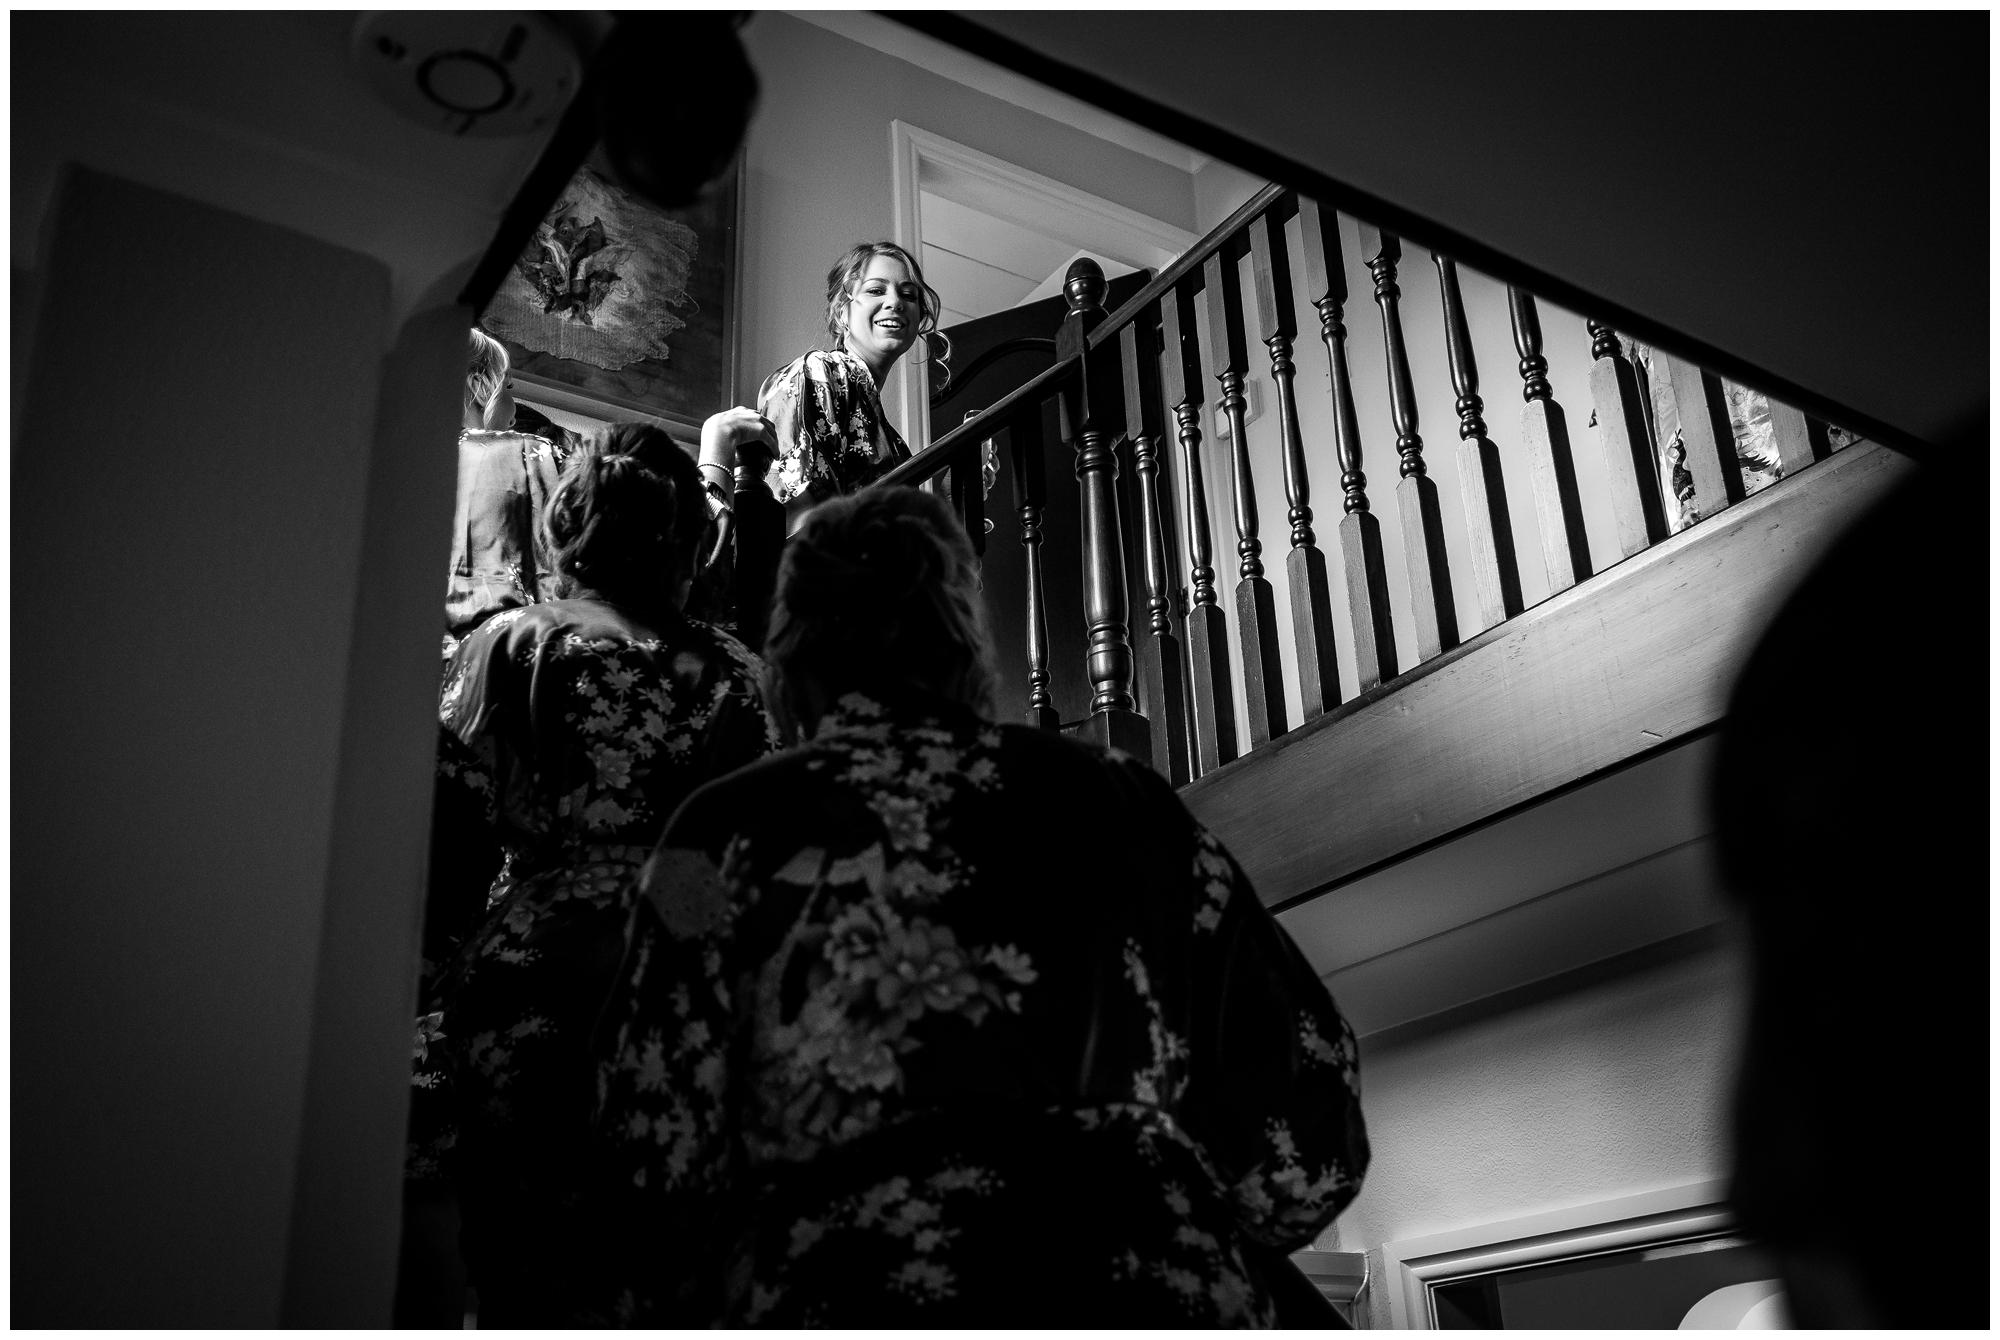 girls making their way up stairs